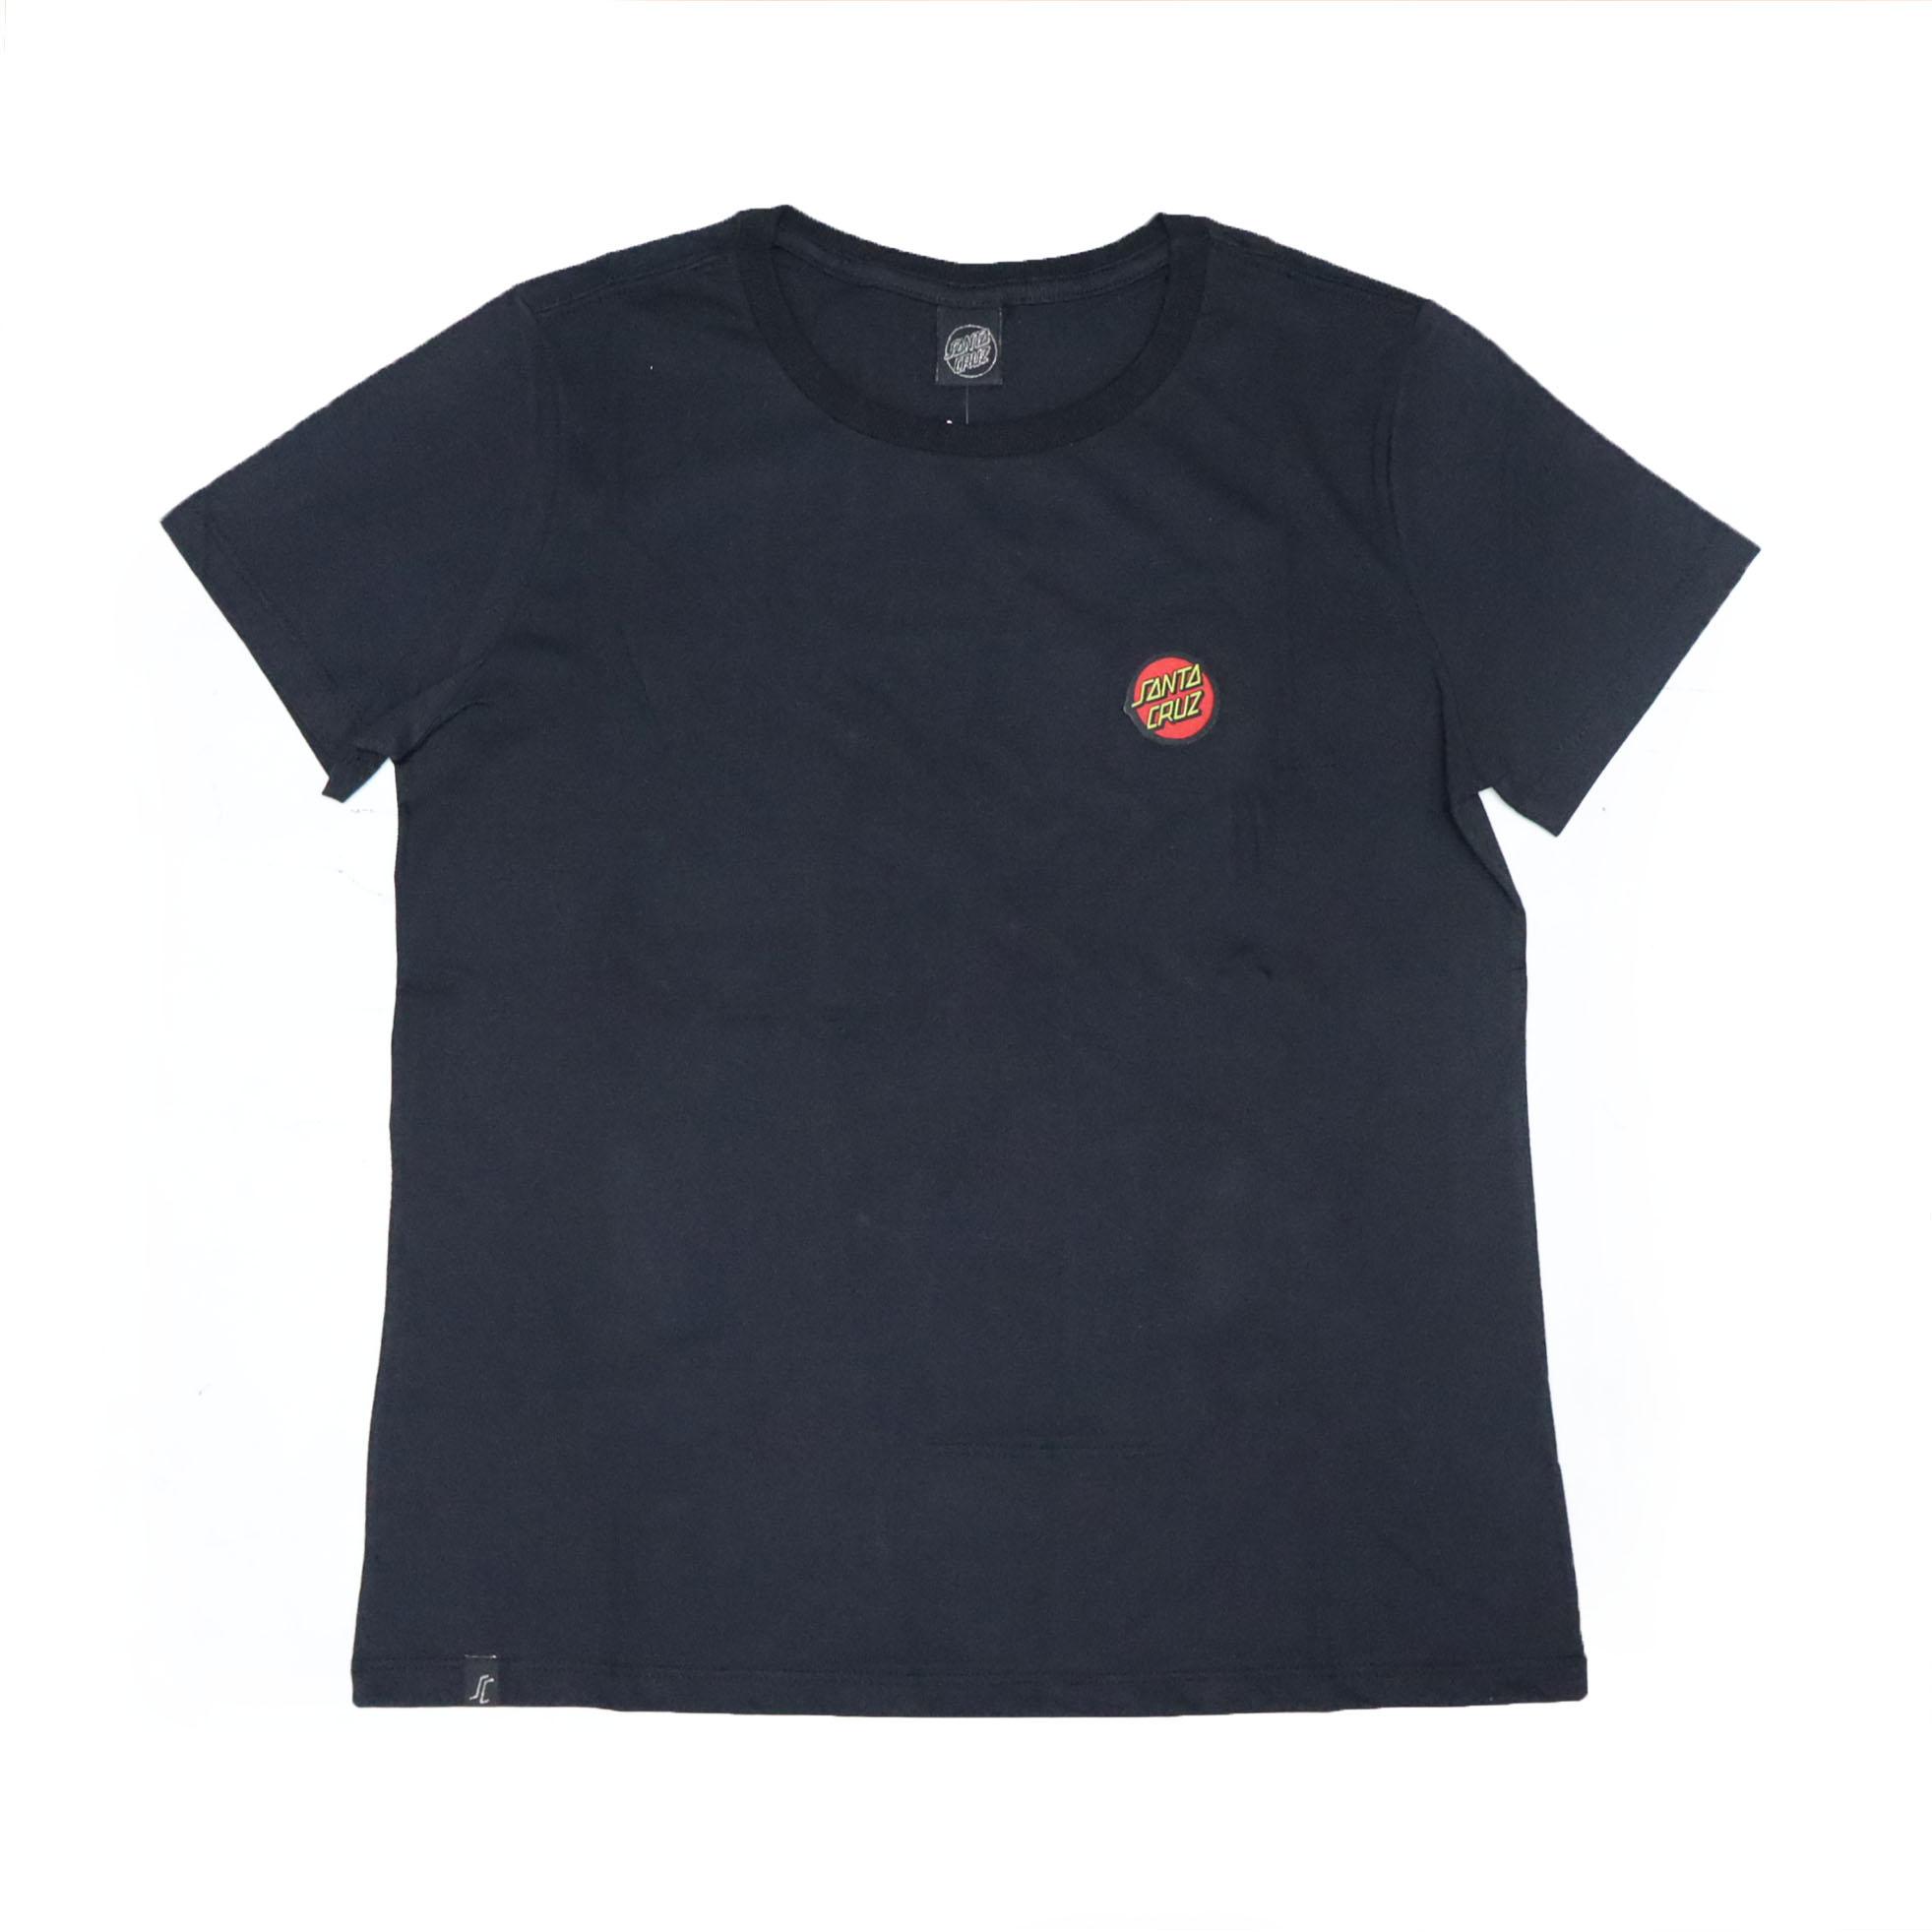 Camiseta Feminina Santa Cruz Classic Dot Chest - Preto